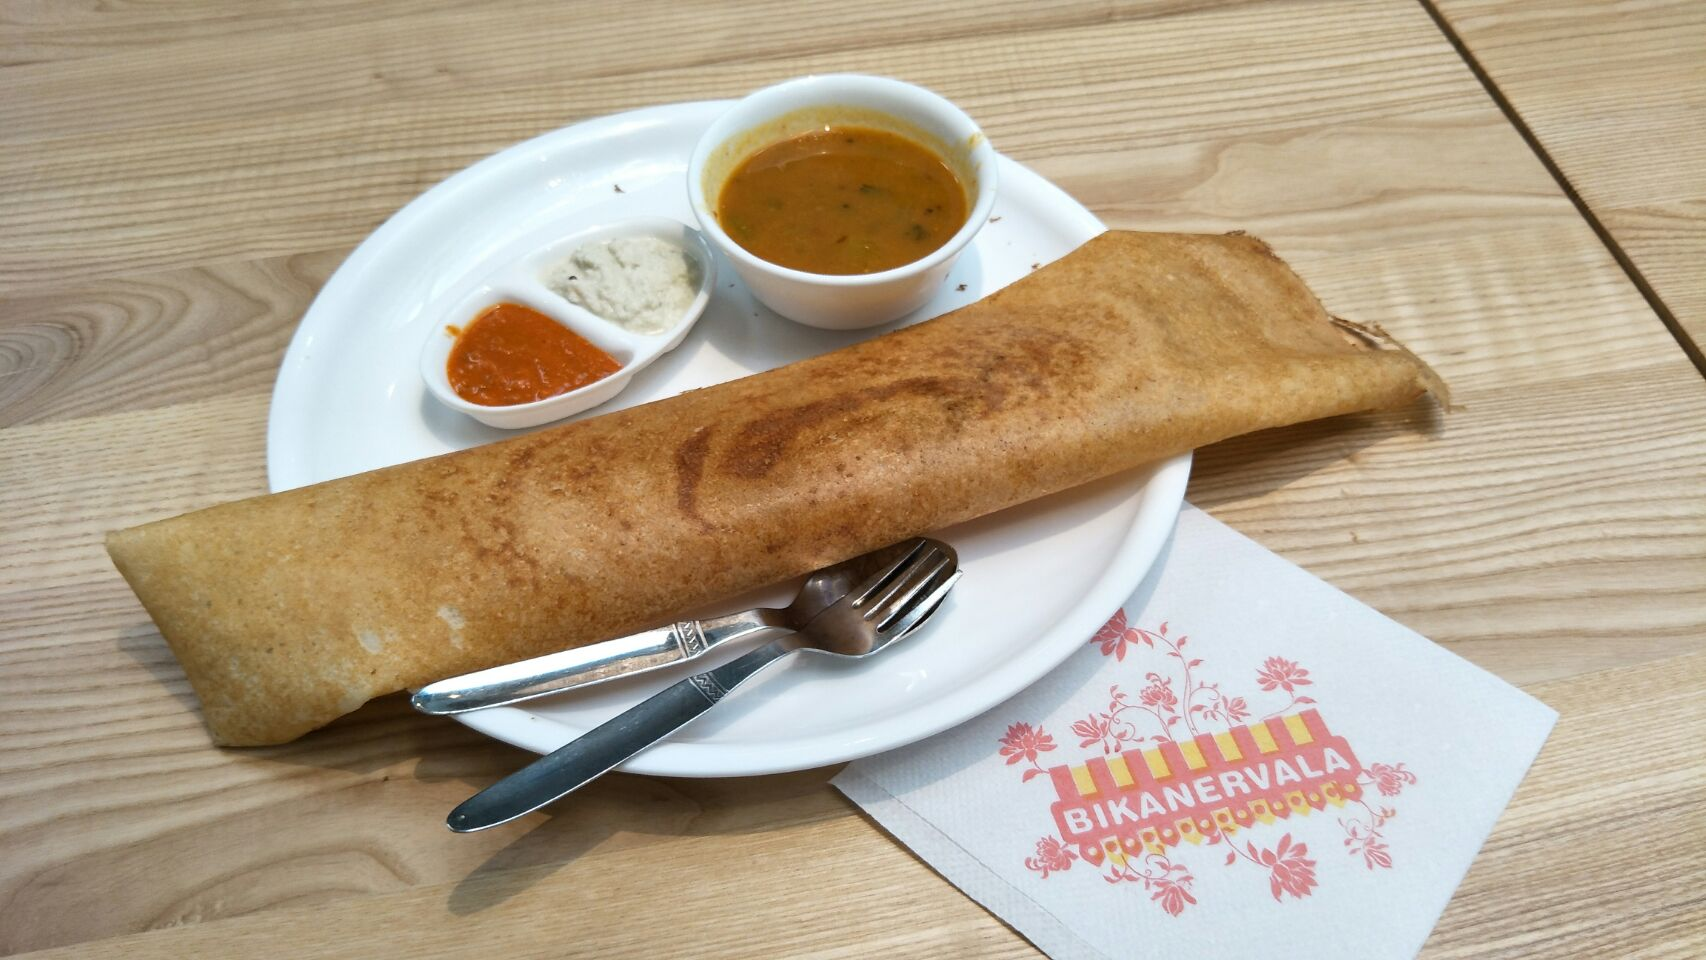 For atas Indian food